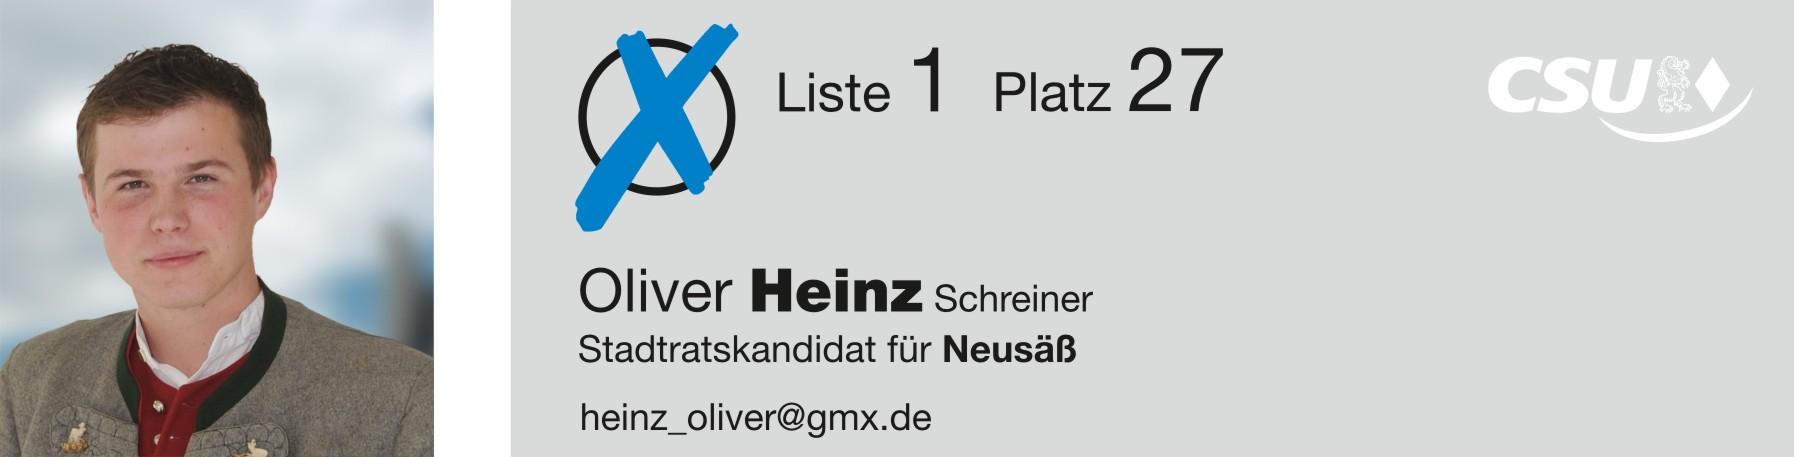 Oliver Heinz